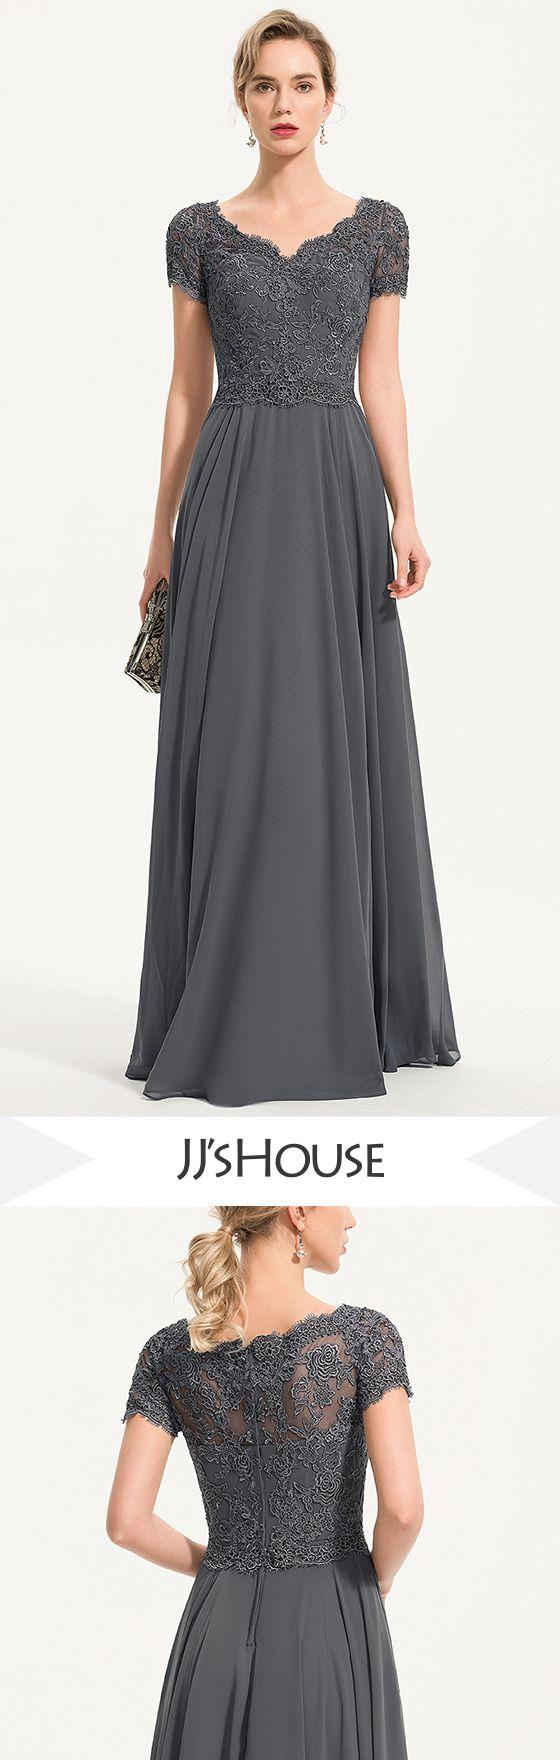 Photo of $199 A-Line V-neck Floor-Length Chiffon Evening Dress With B…